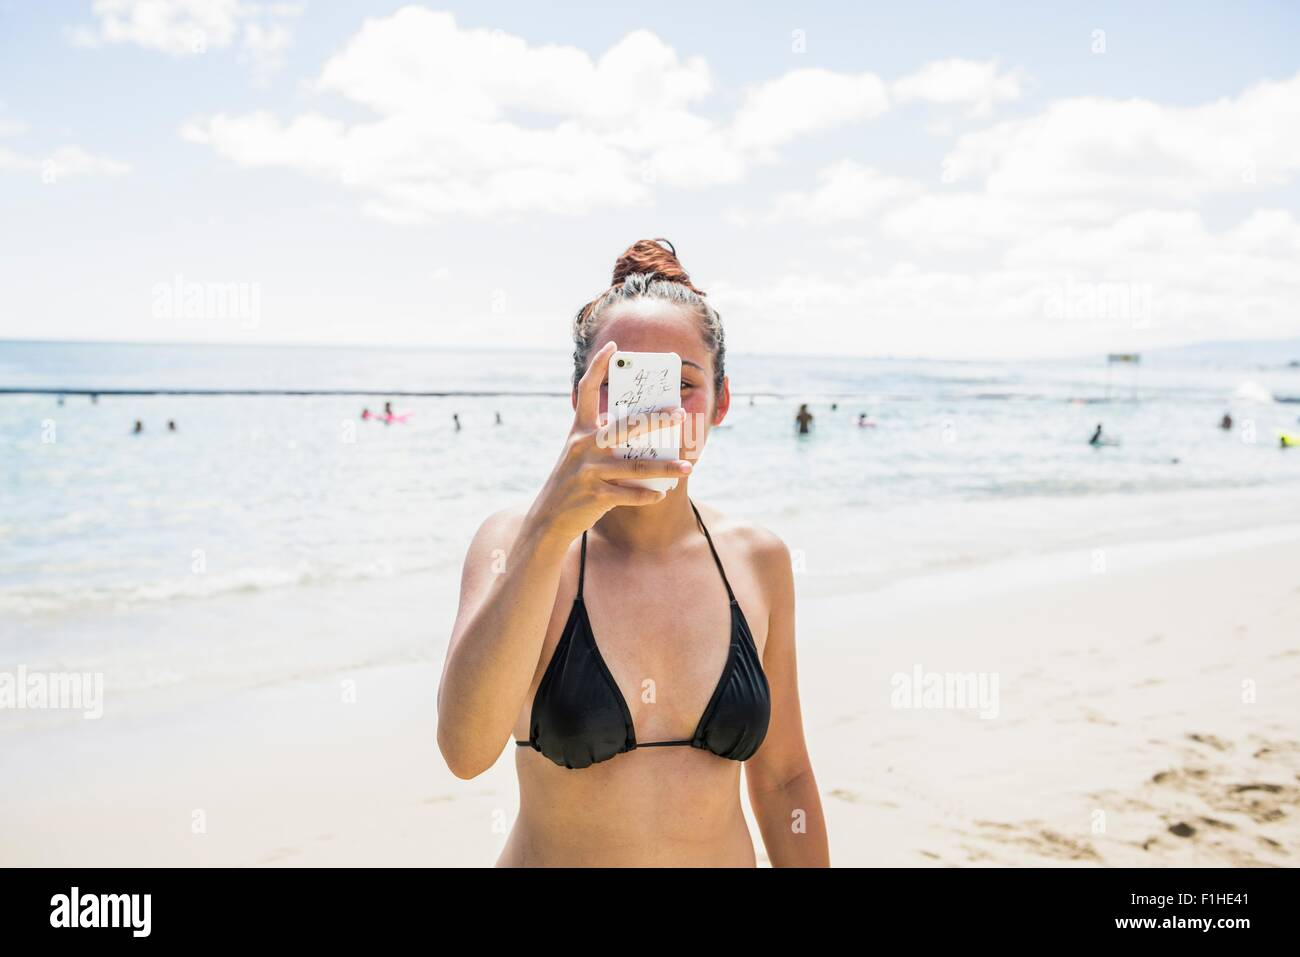 Young woman wearing bikini top taking smartphone selfie on Waikiki Beach, Hawaii, USA - Stock Image